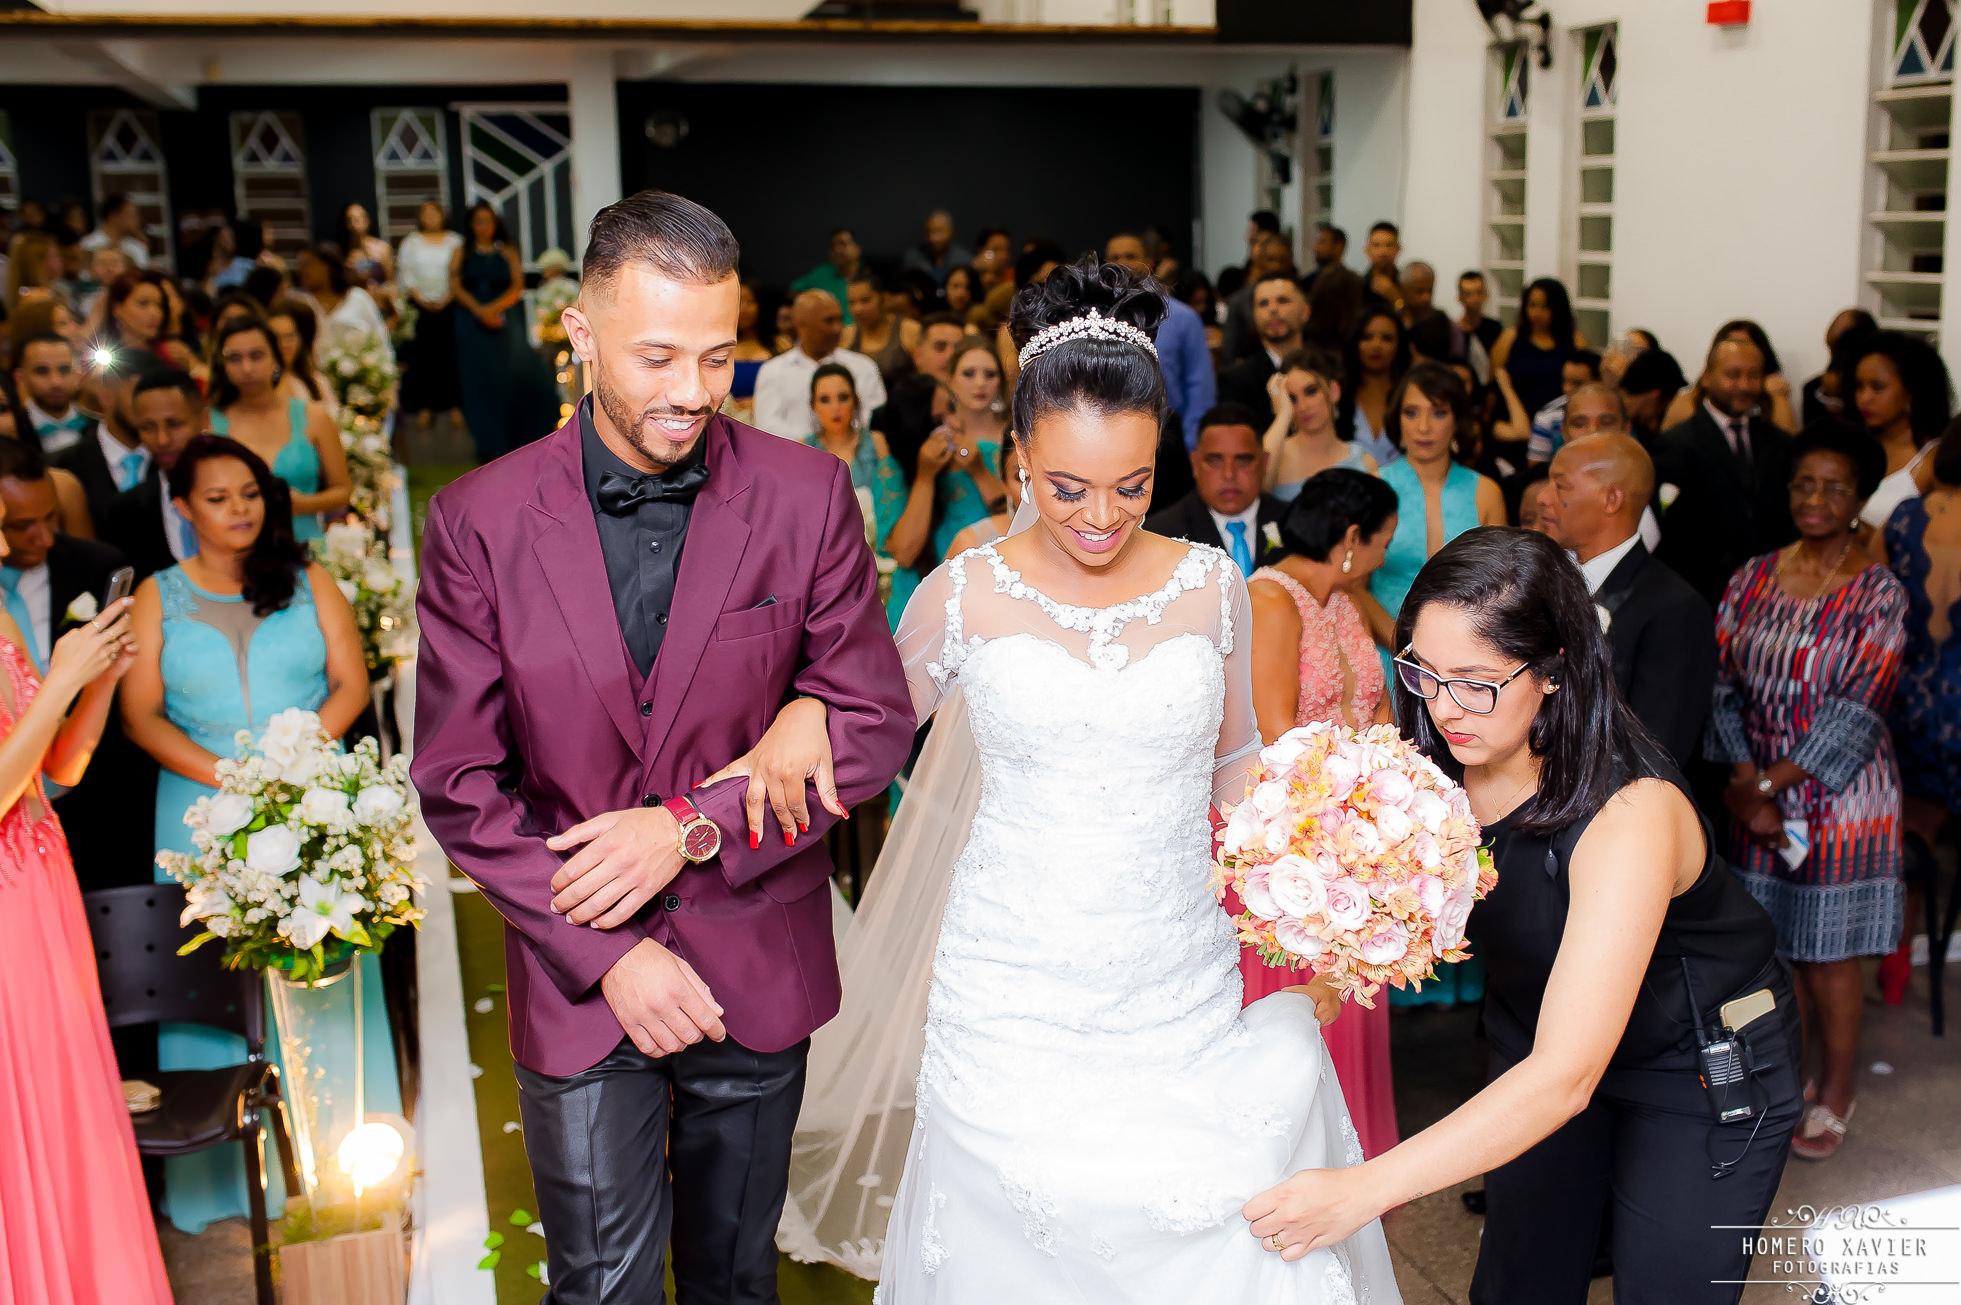 fotografia casamento Igreja Batista Nova Esperanca em bh